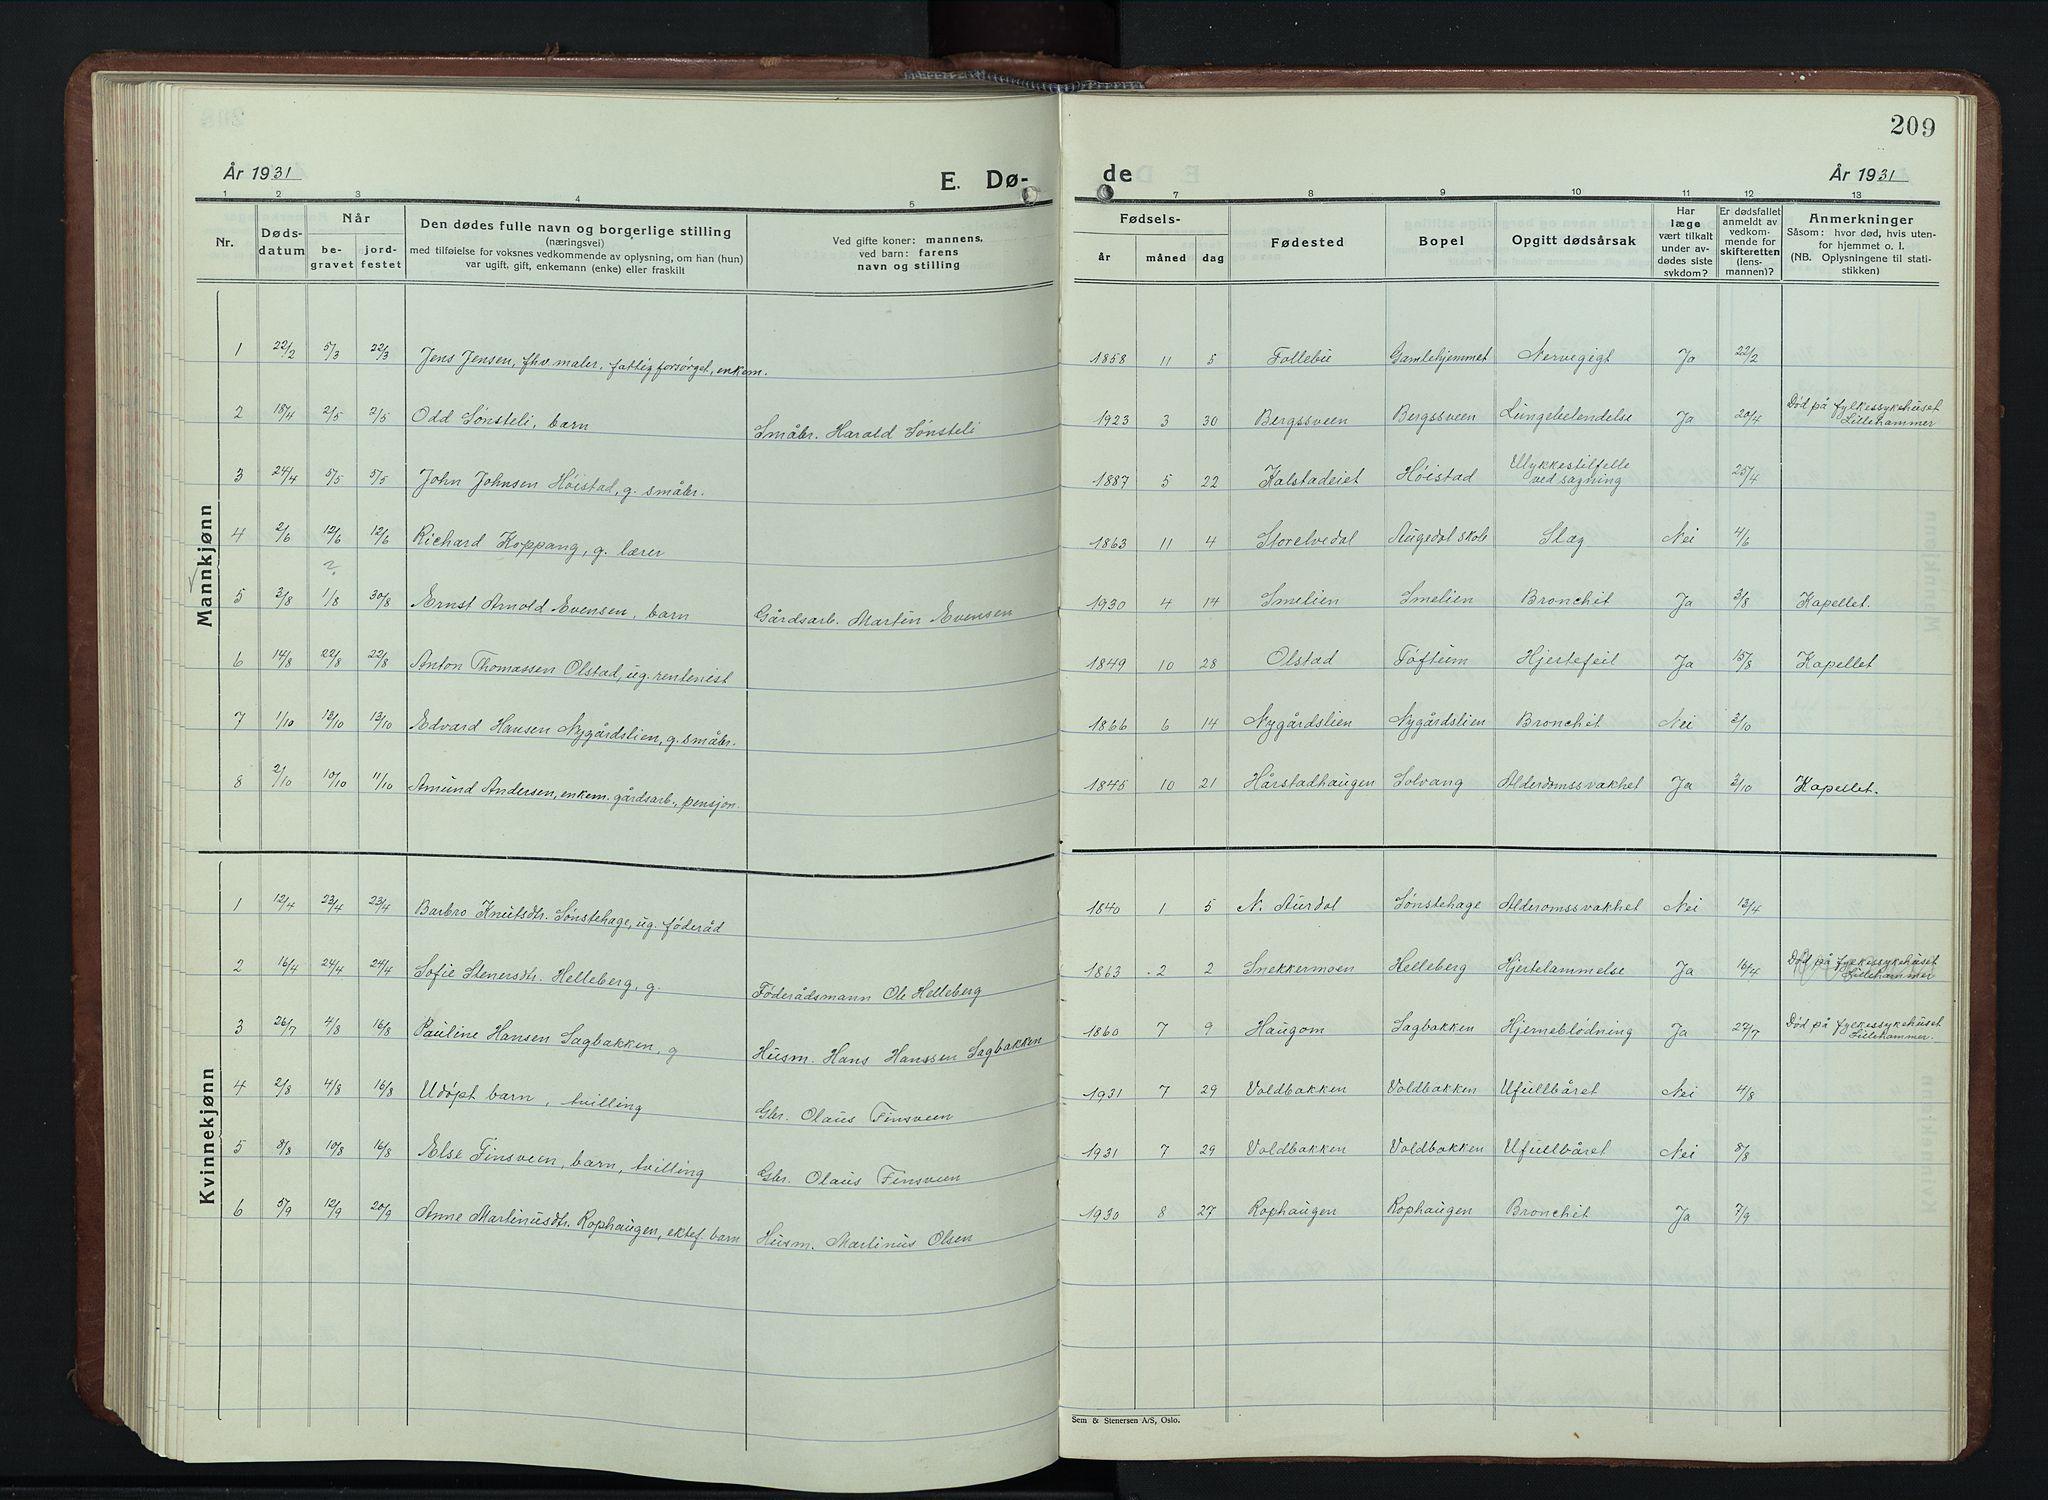 SAH, Vestre Gausdal prestekontor, Klokkerbok nr. 5, 1926-1955, s. 209